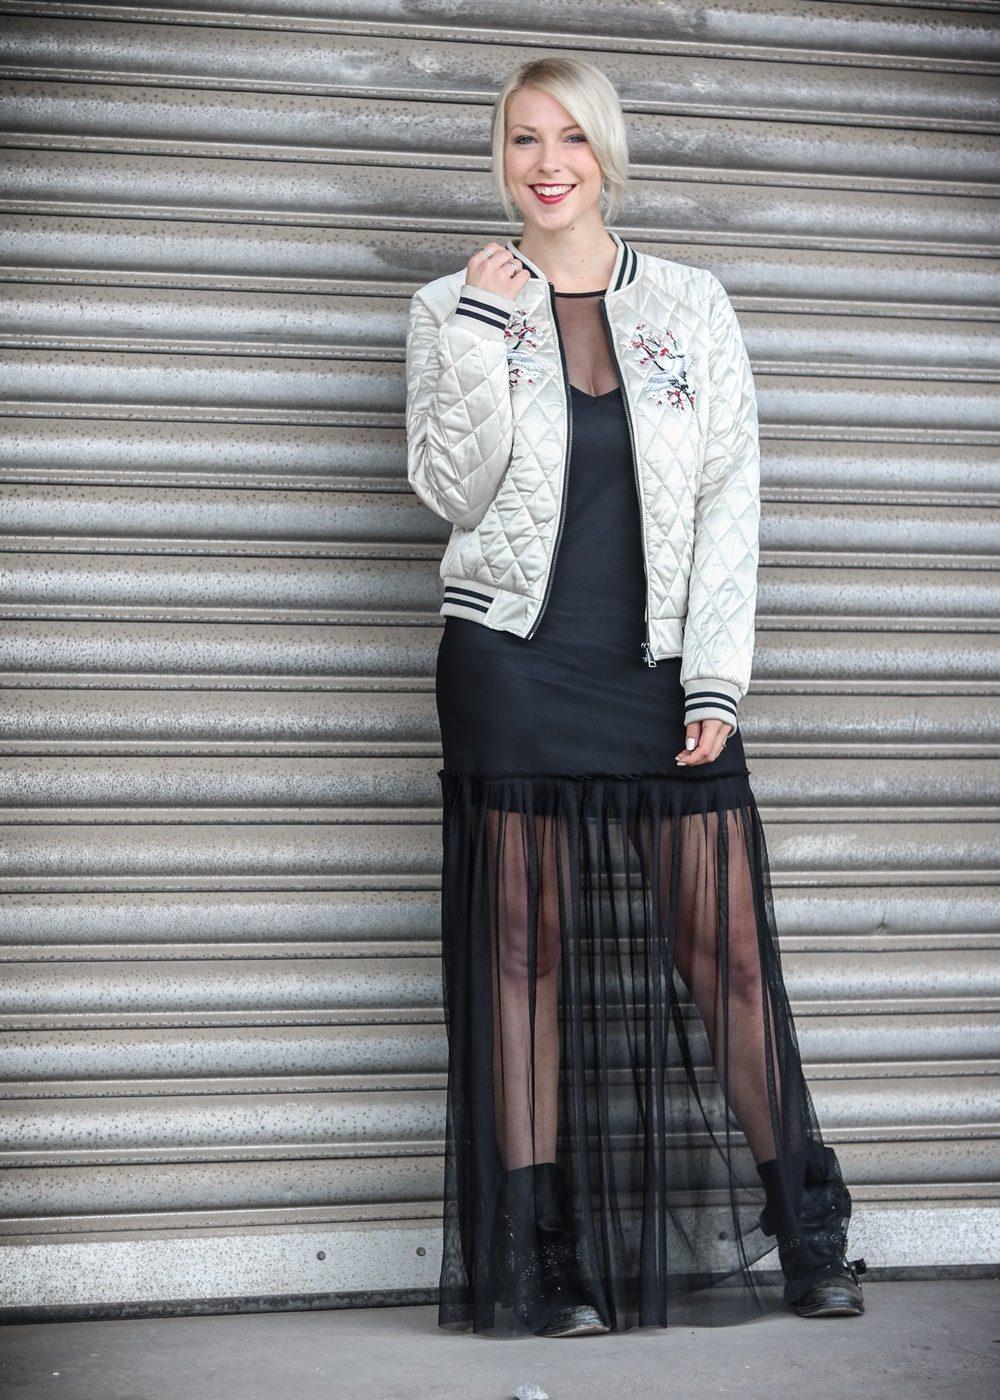 outfit-fashionbloggerin-bomberjacke-vero-moda-bikerboots-schwarzes-maxikleid-transparent-stradivarius-2